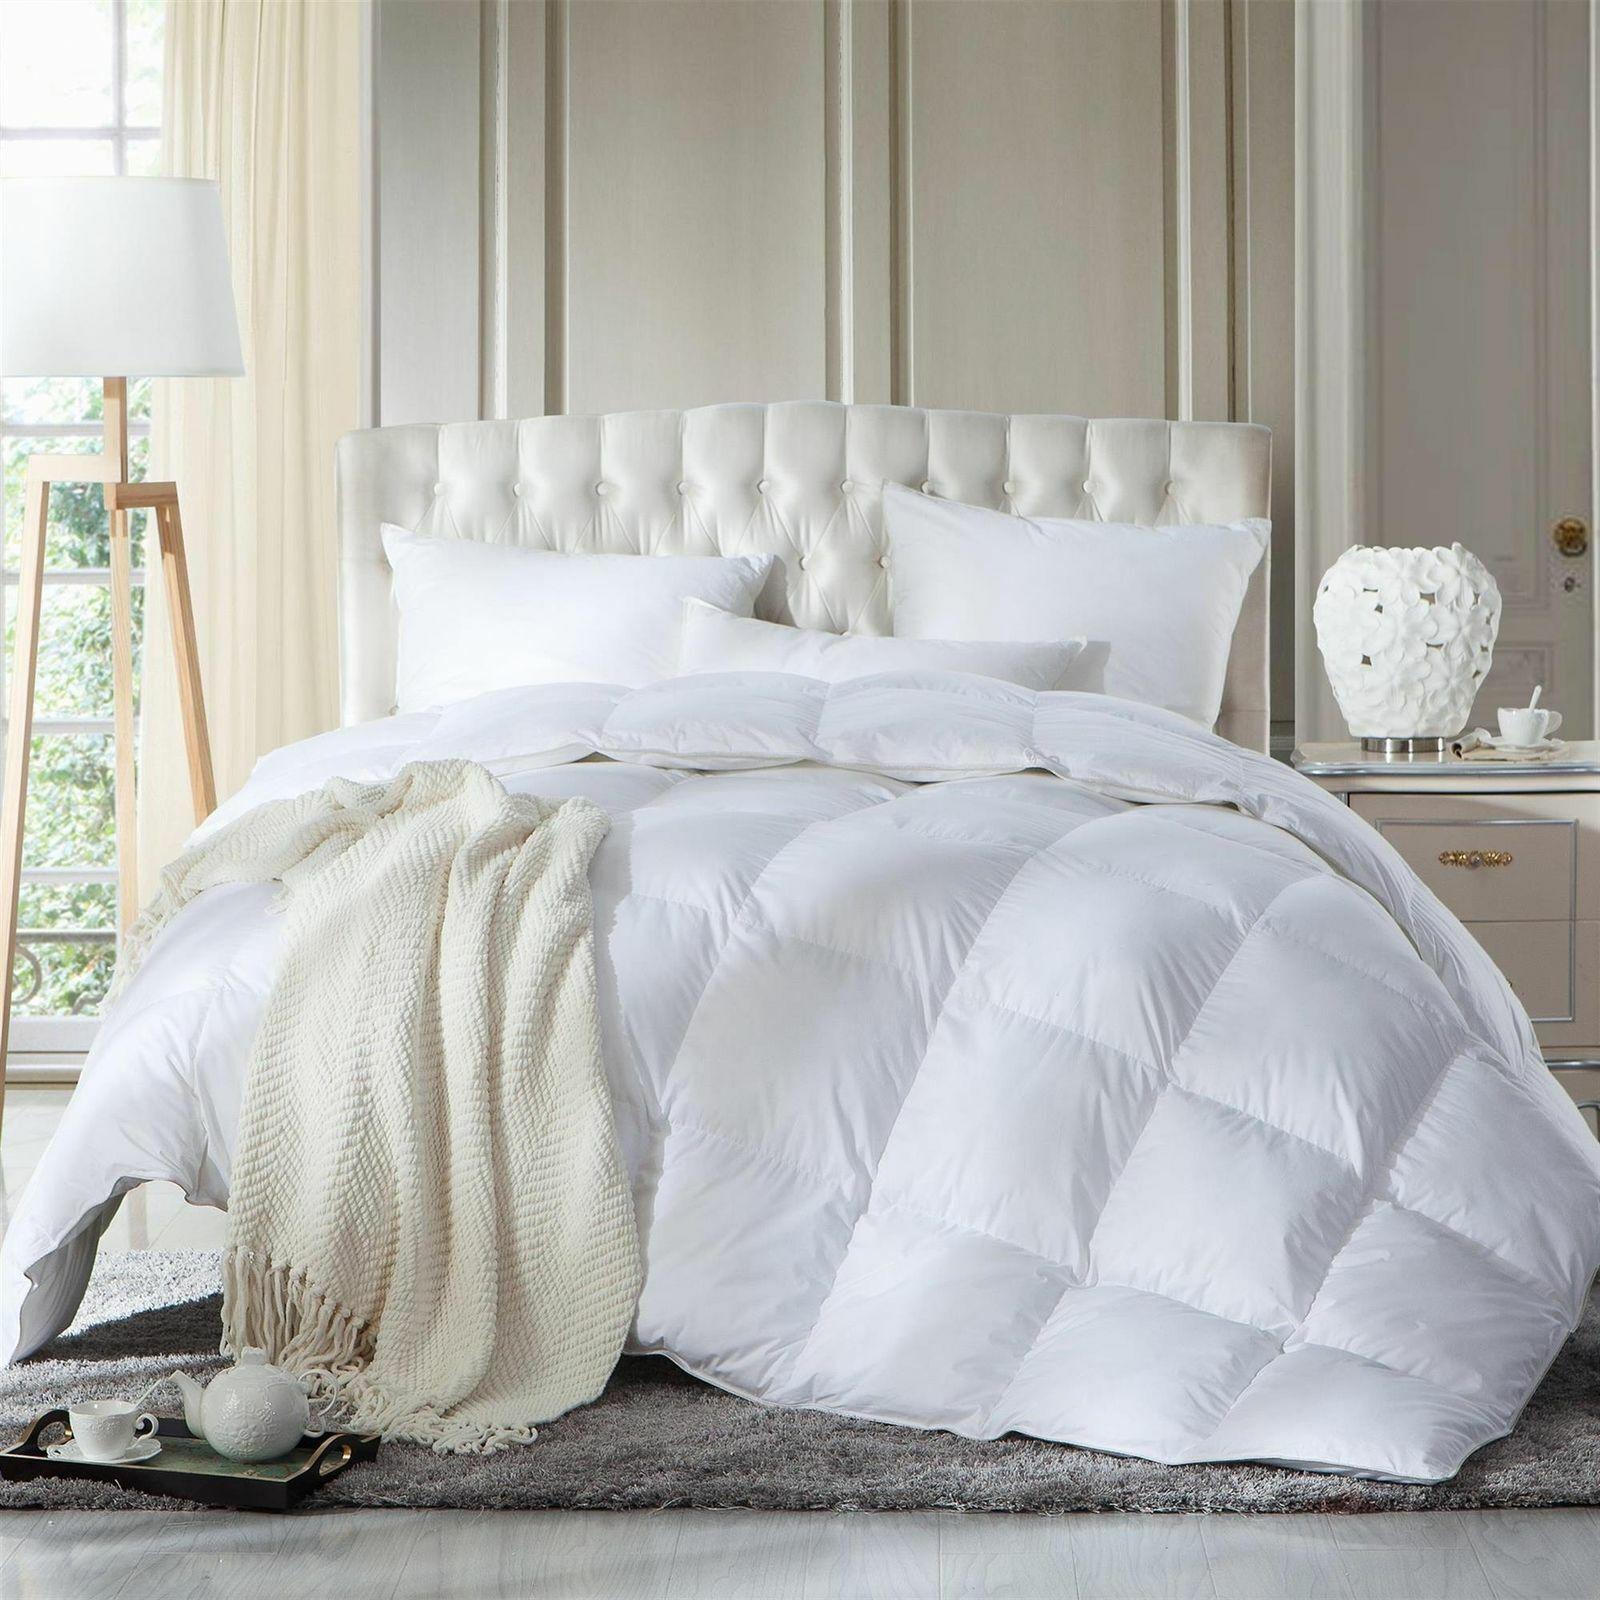 Duck Feather 13 5 Tog Duvet Quilt Pillows Hypoallergenic Super Soft King Bed Set Ebay